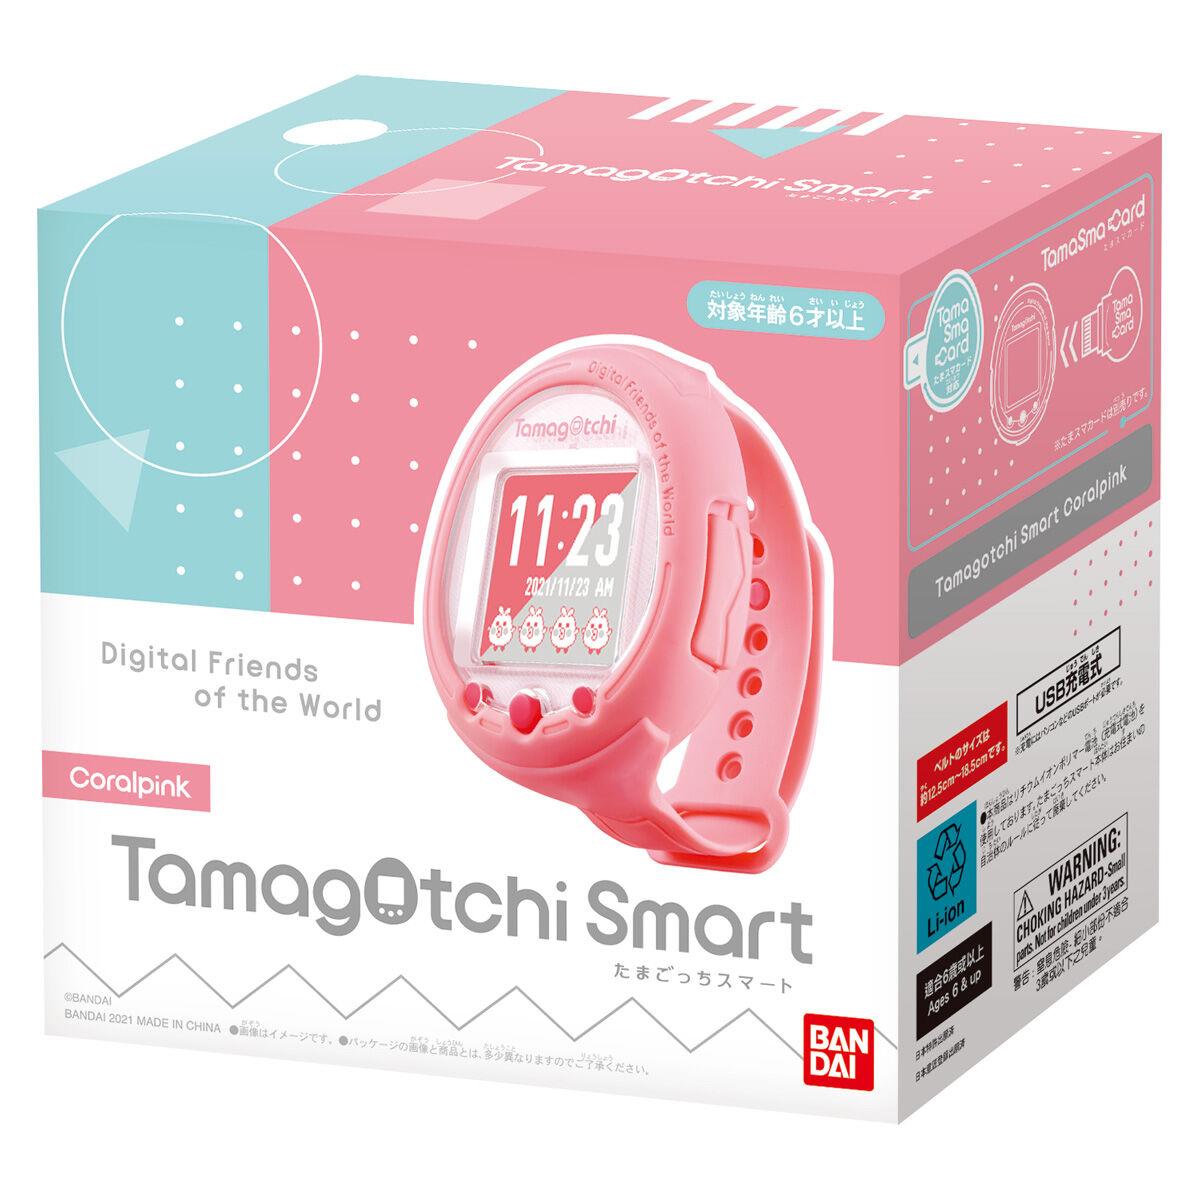 Tamagotchi Smart Coralpink